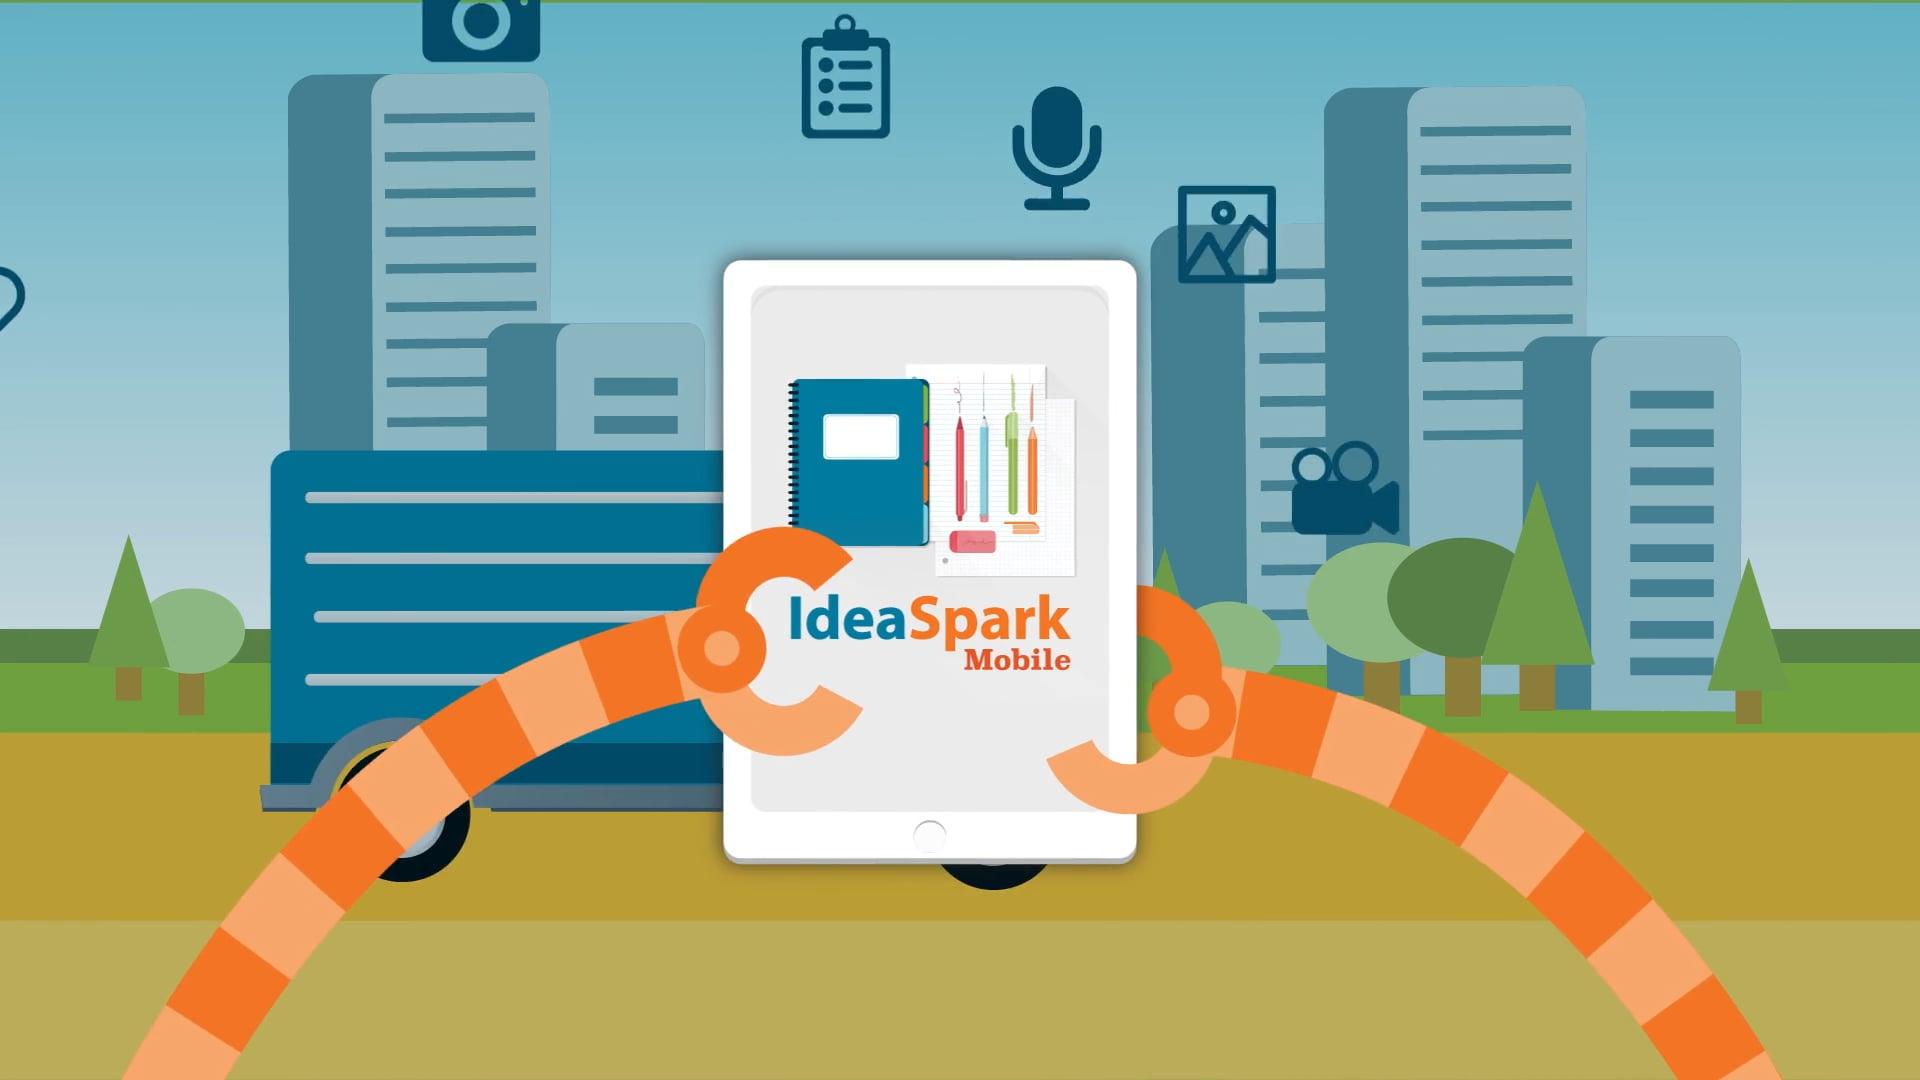 Cubic's Ideaspark Mobile App - 2 min Promo Video